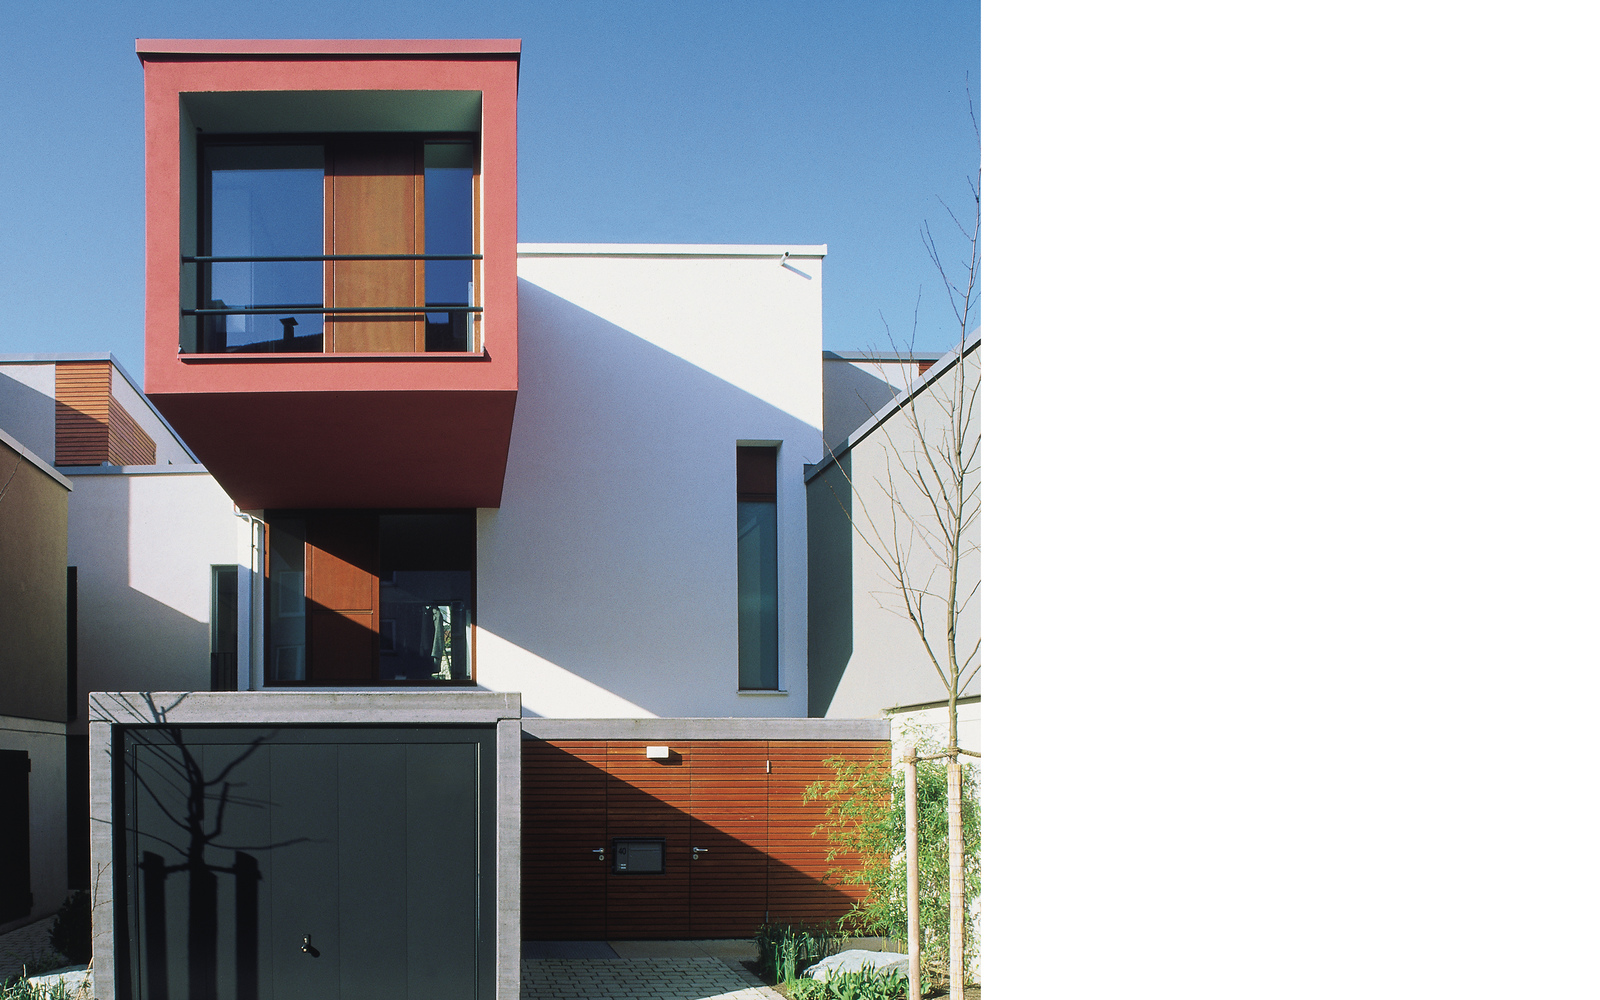 Architekten Ulm braunger wörtz architekten ulm 031 neubau baublock 400 in neu ulm